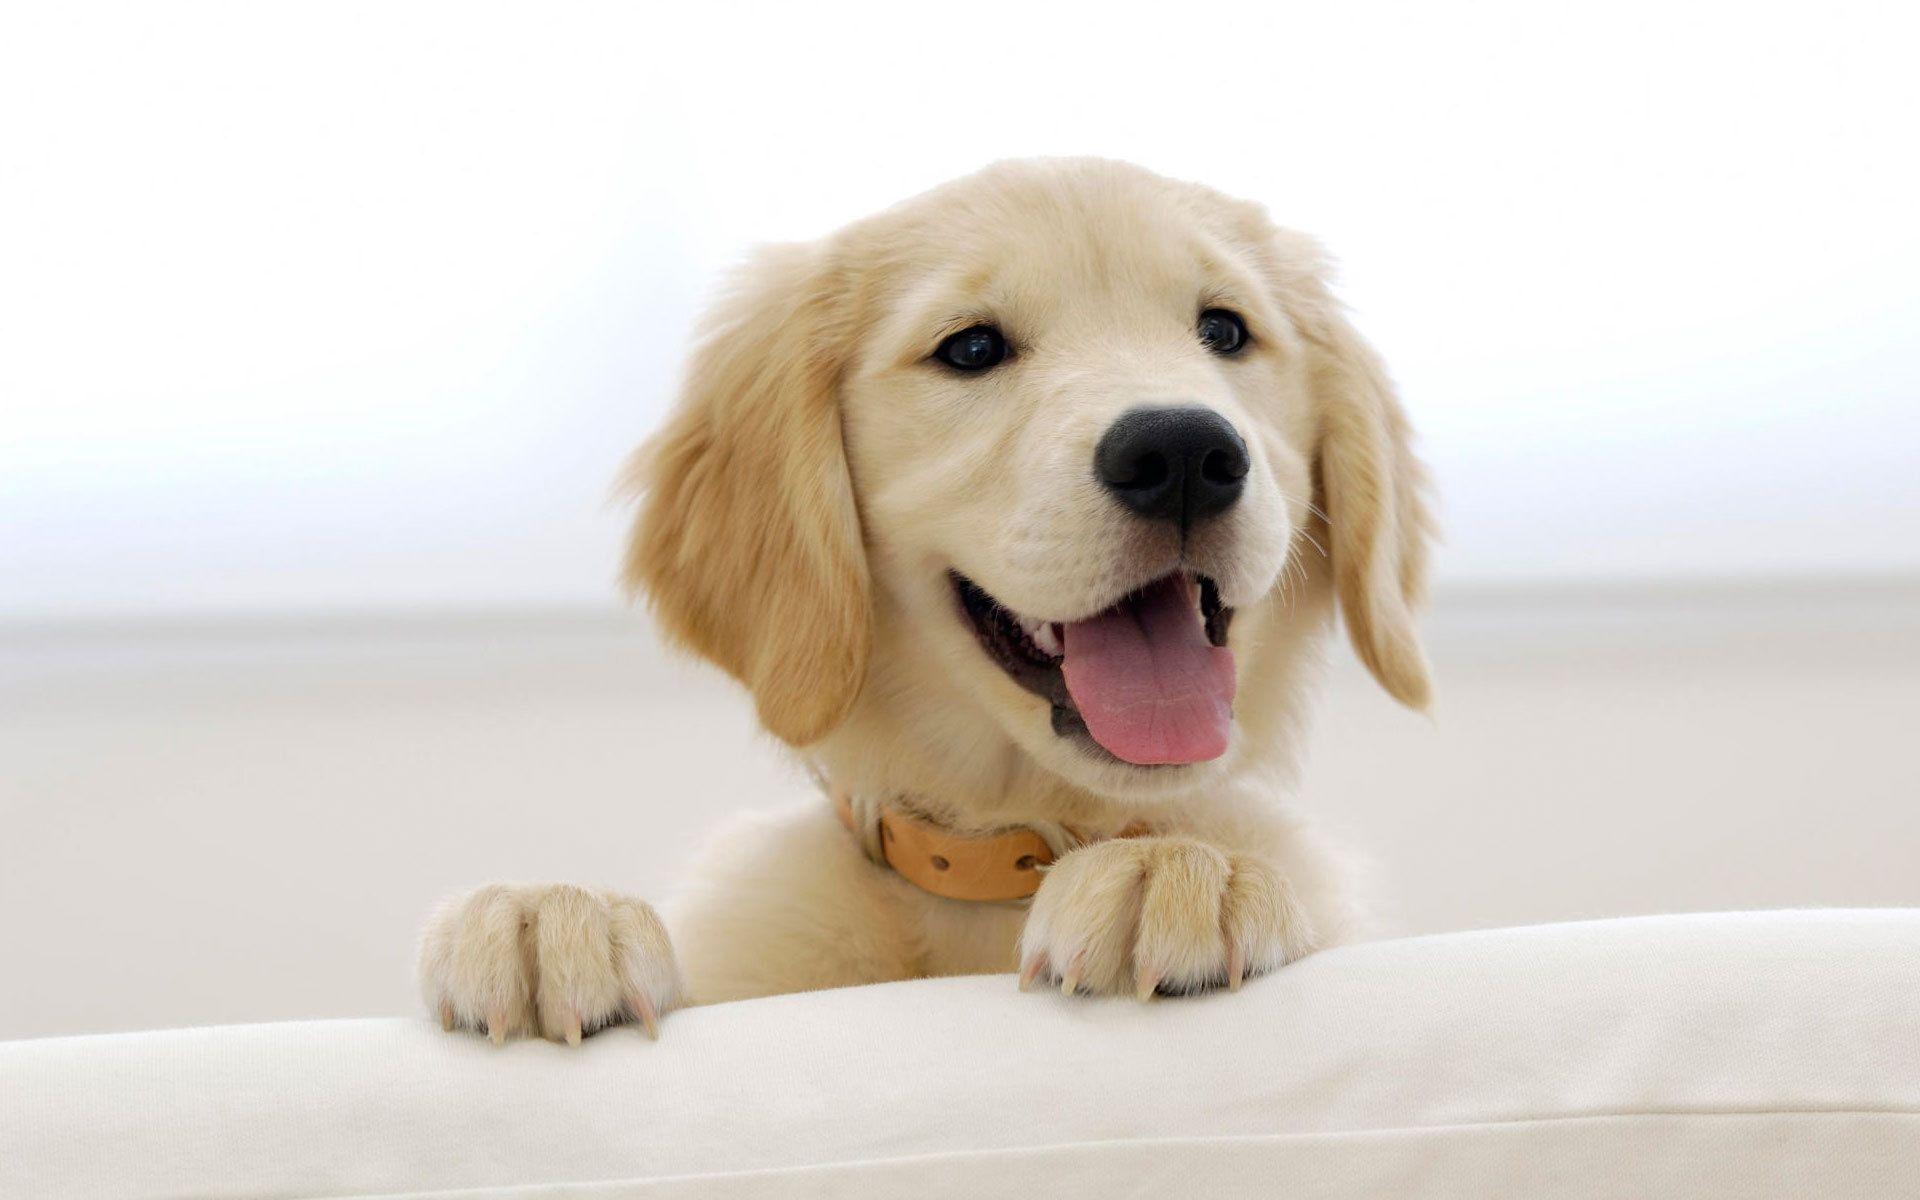 cute dog wallpaper free download